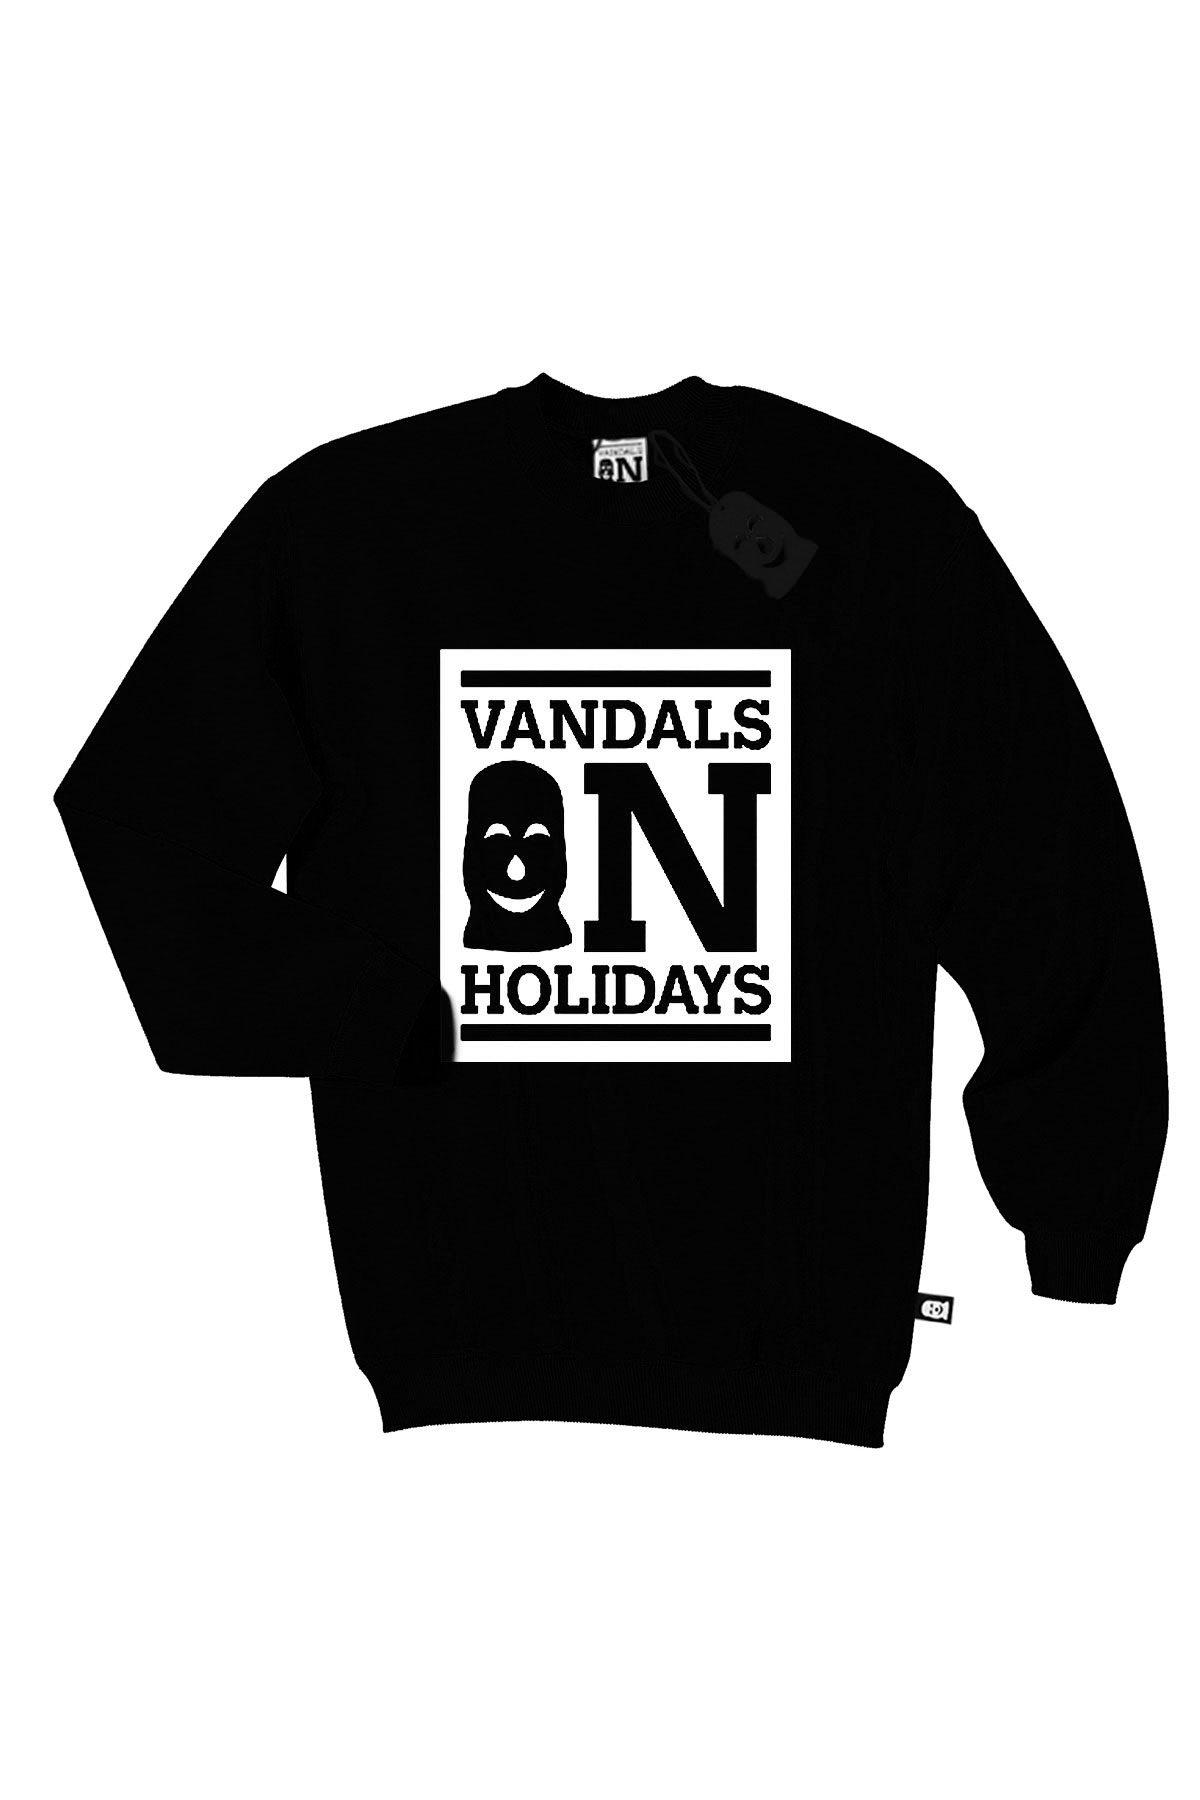 Vandals On Holidays CLASSIC-LOGO Felpa girocollo Nera